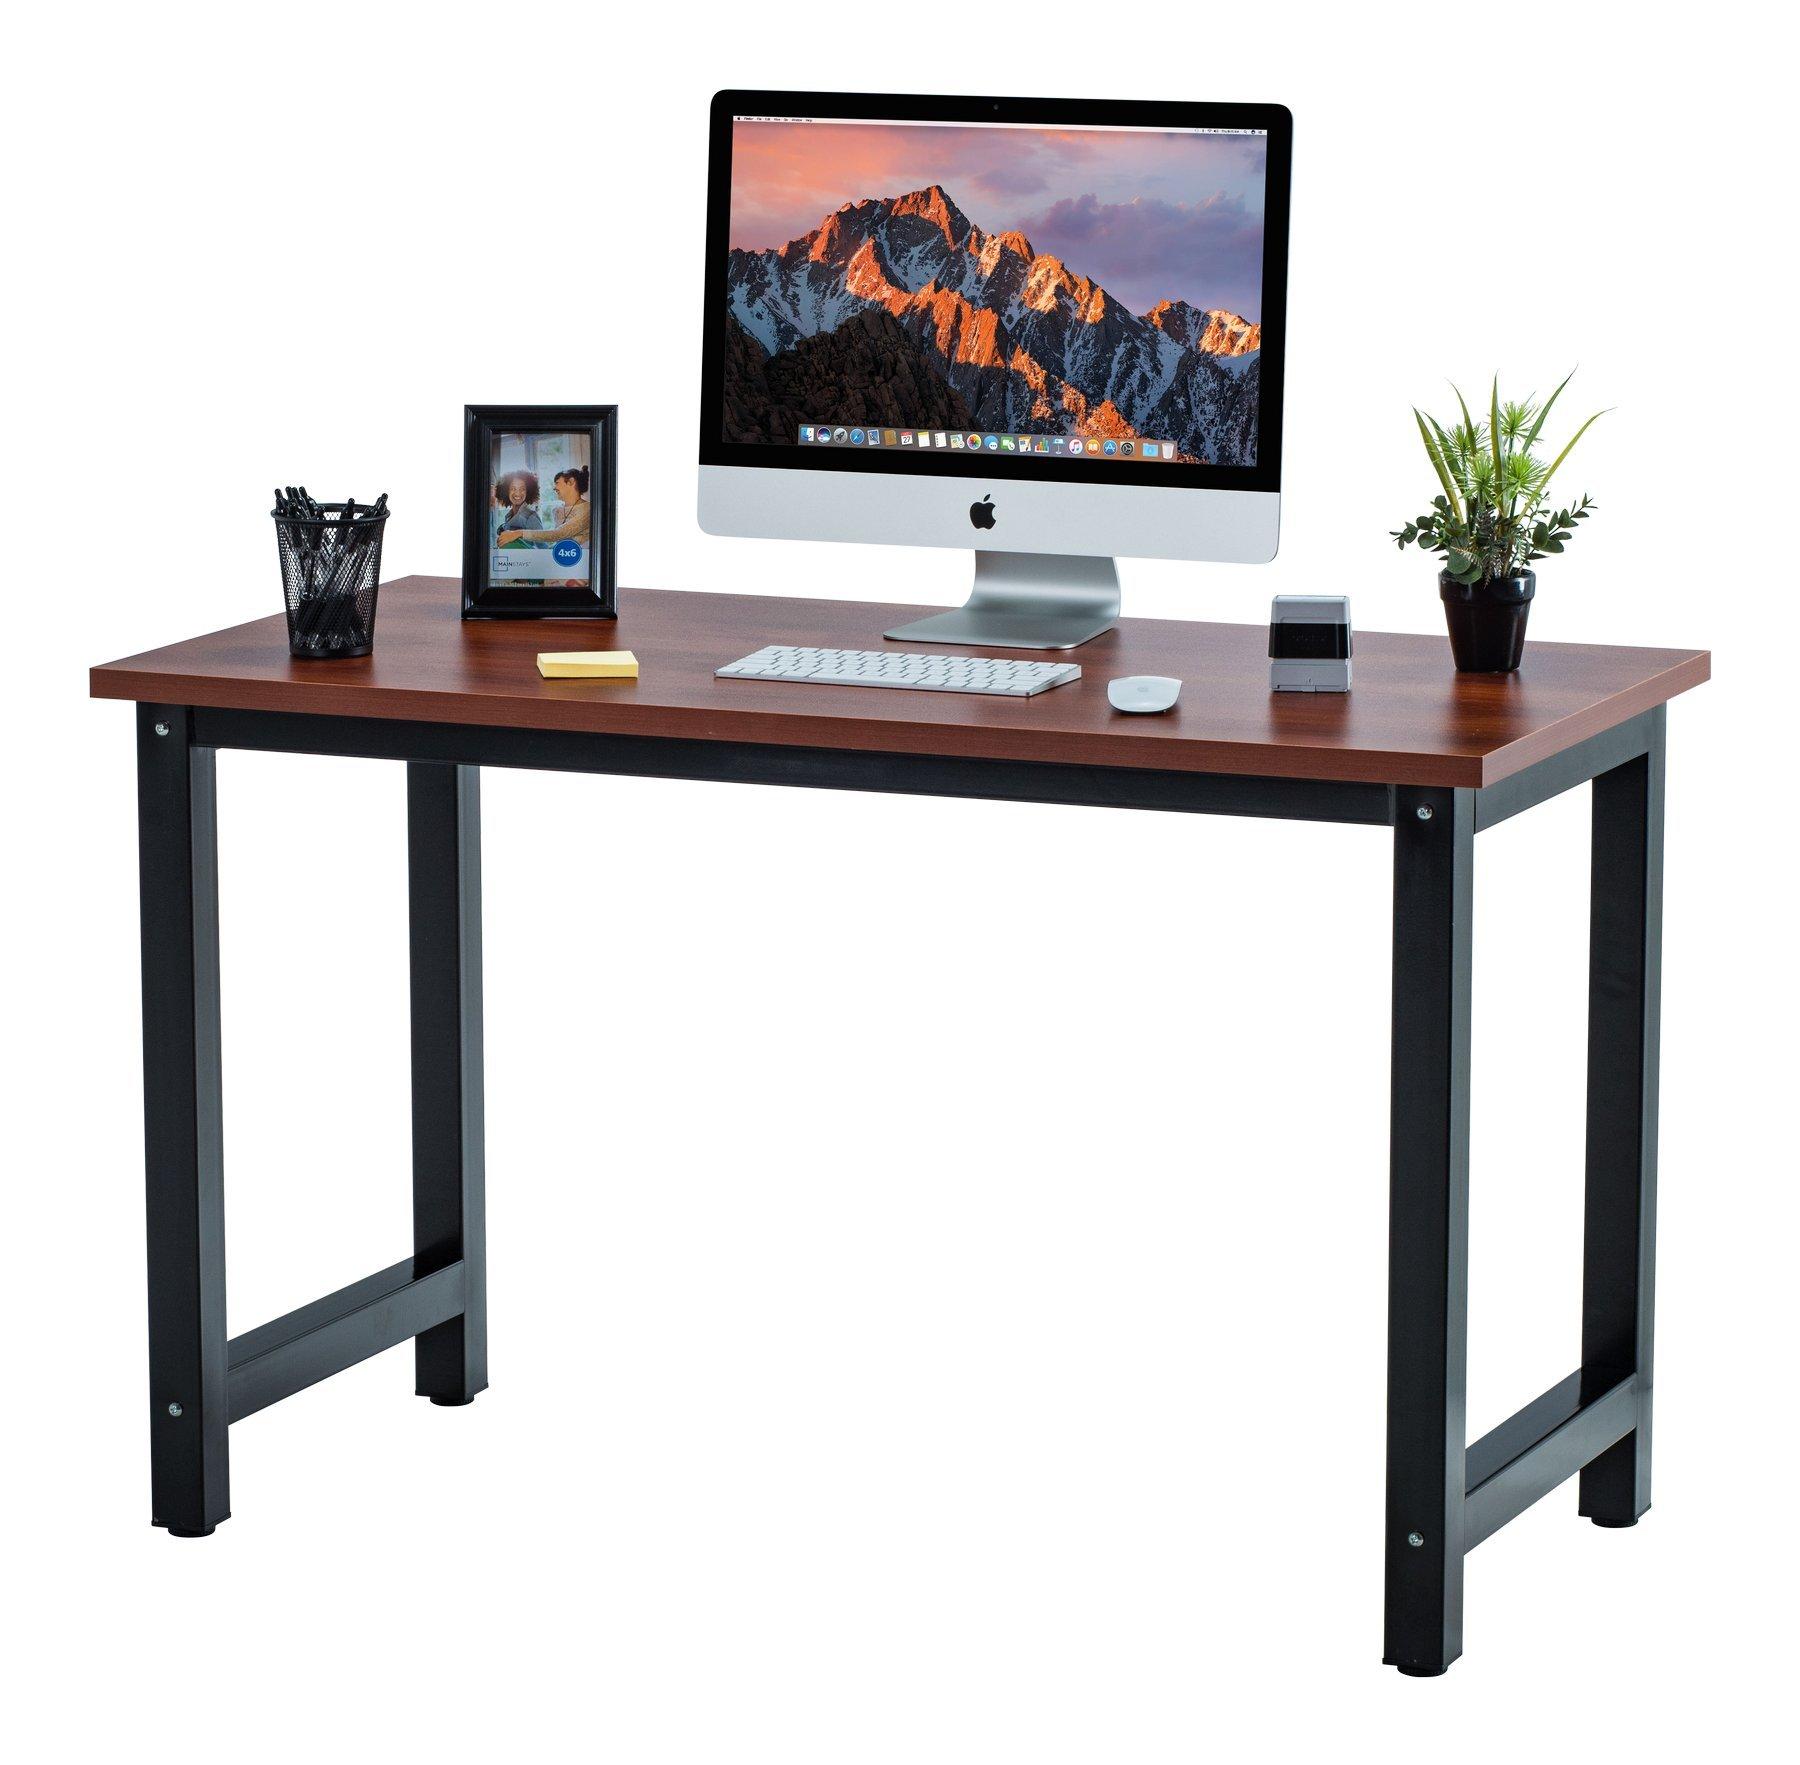 "Fineboard 47"" Stylish Home Office Computer Desk Writing Table Elegant & Modern Design, Teak/Black"